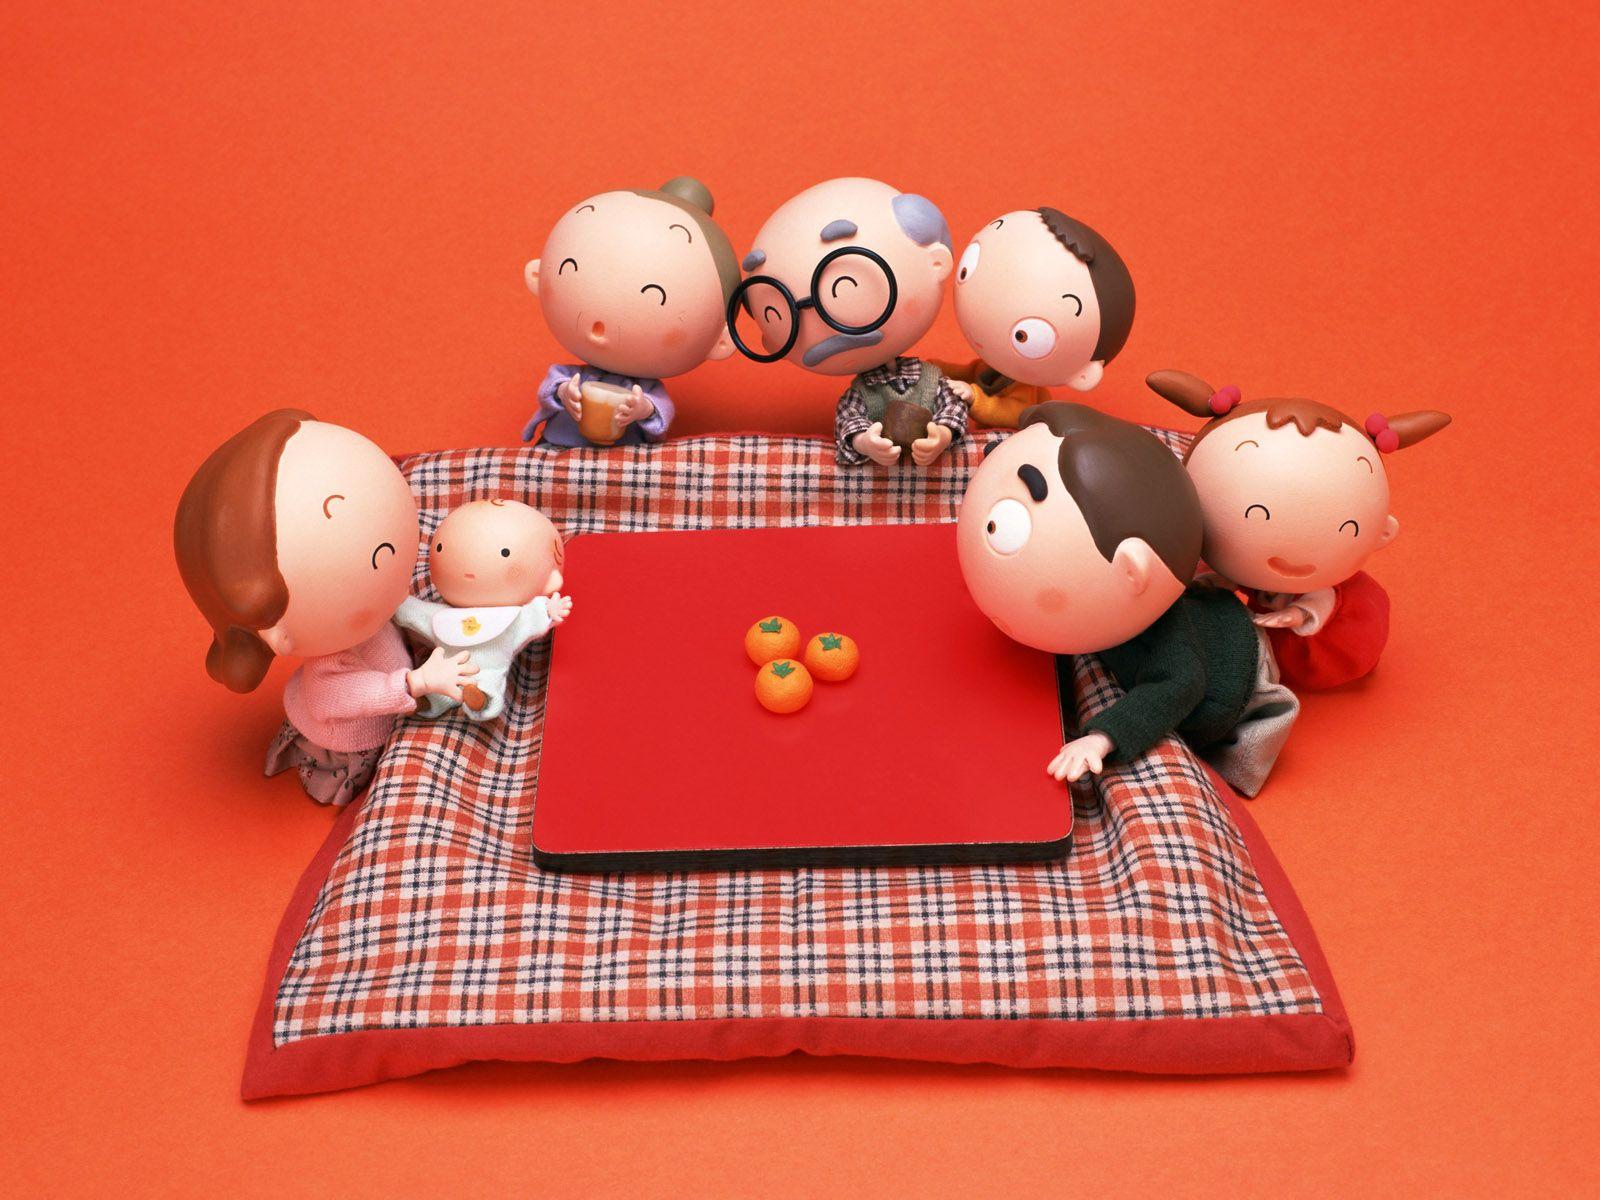 happy-family-happy-life-cute-cartoon-picture_00154071.jpg (1600×1200)